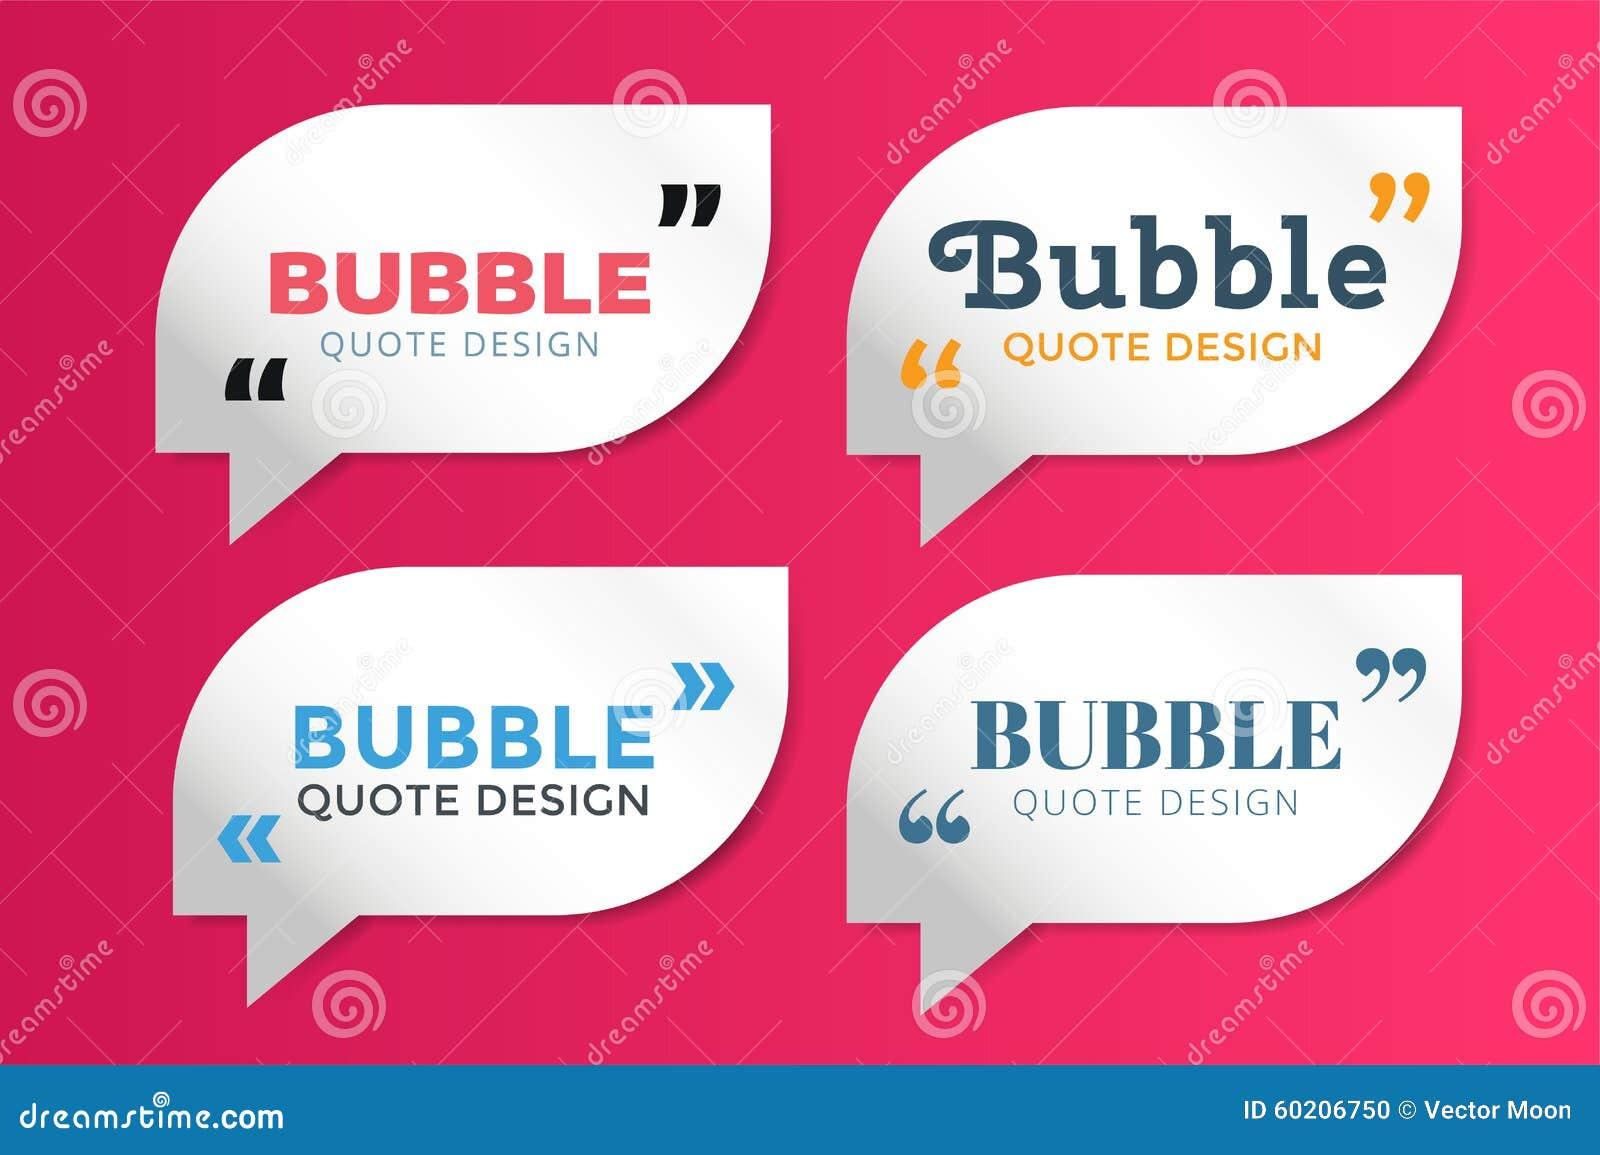 bubble outline for essay